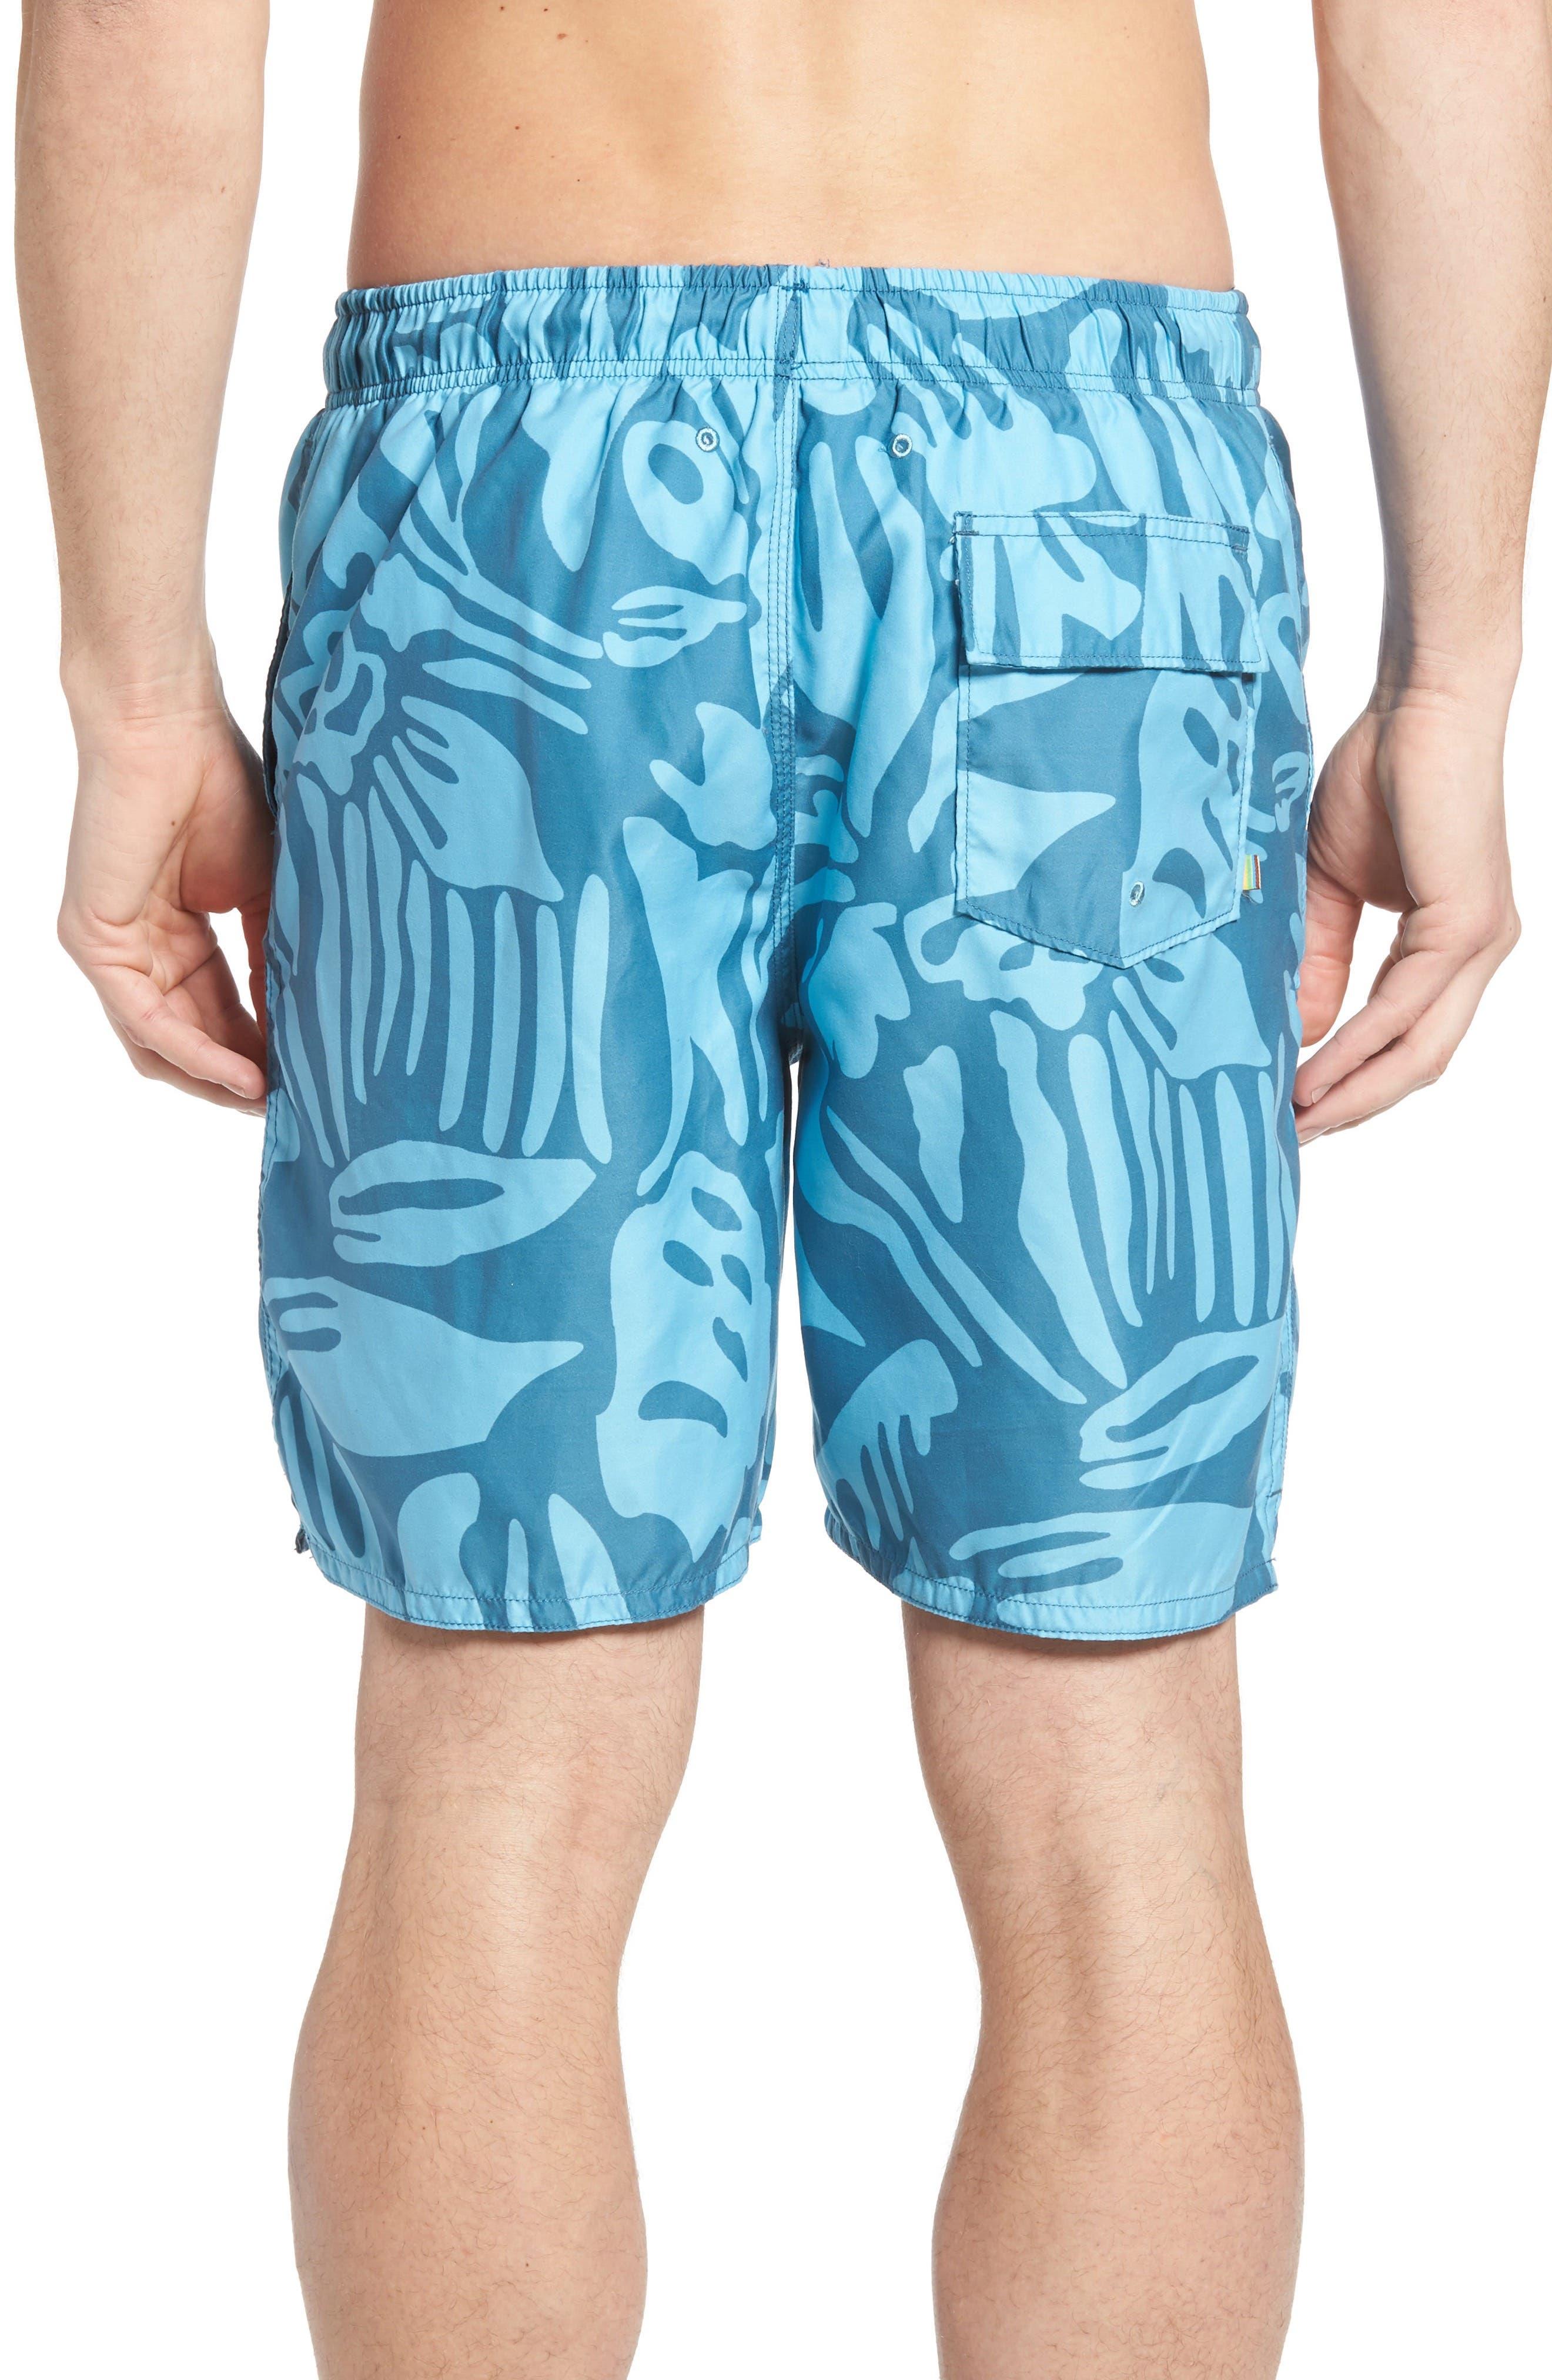 Viceroy Print Swim Trunks,                             Alternate thumbnail 2, color,                             Blue